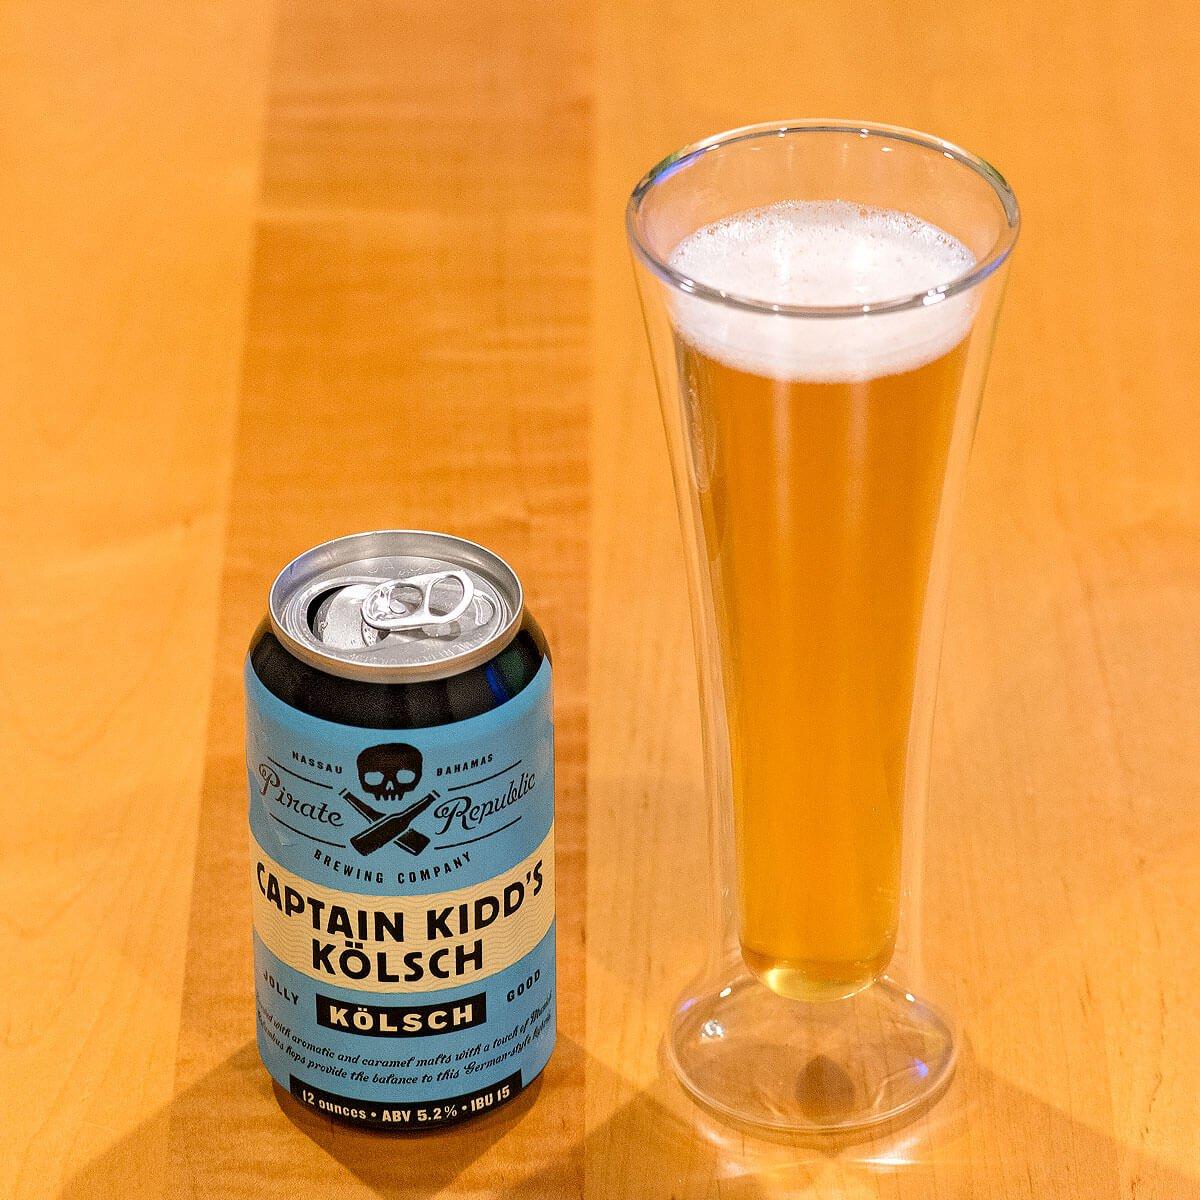 Captain Kidd's Kölsch, a German-style Kölsch by Pirate Republic Brewing Company